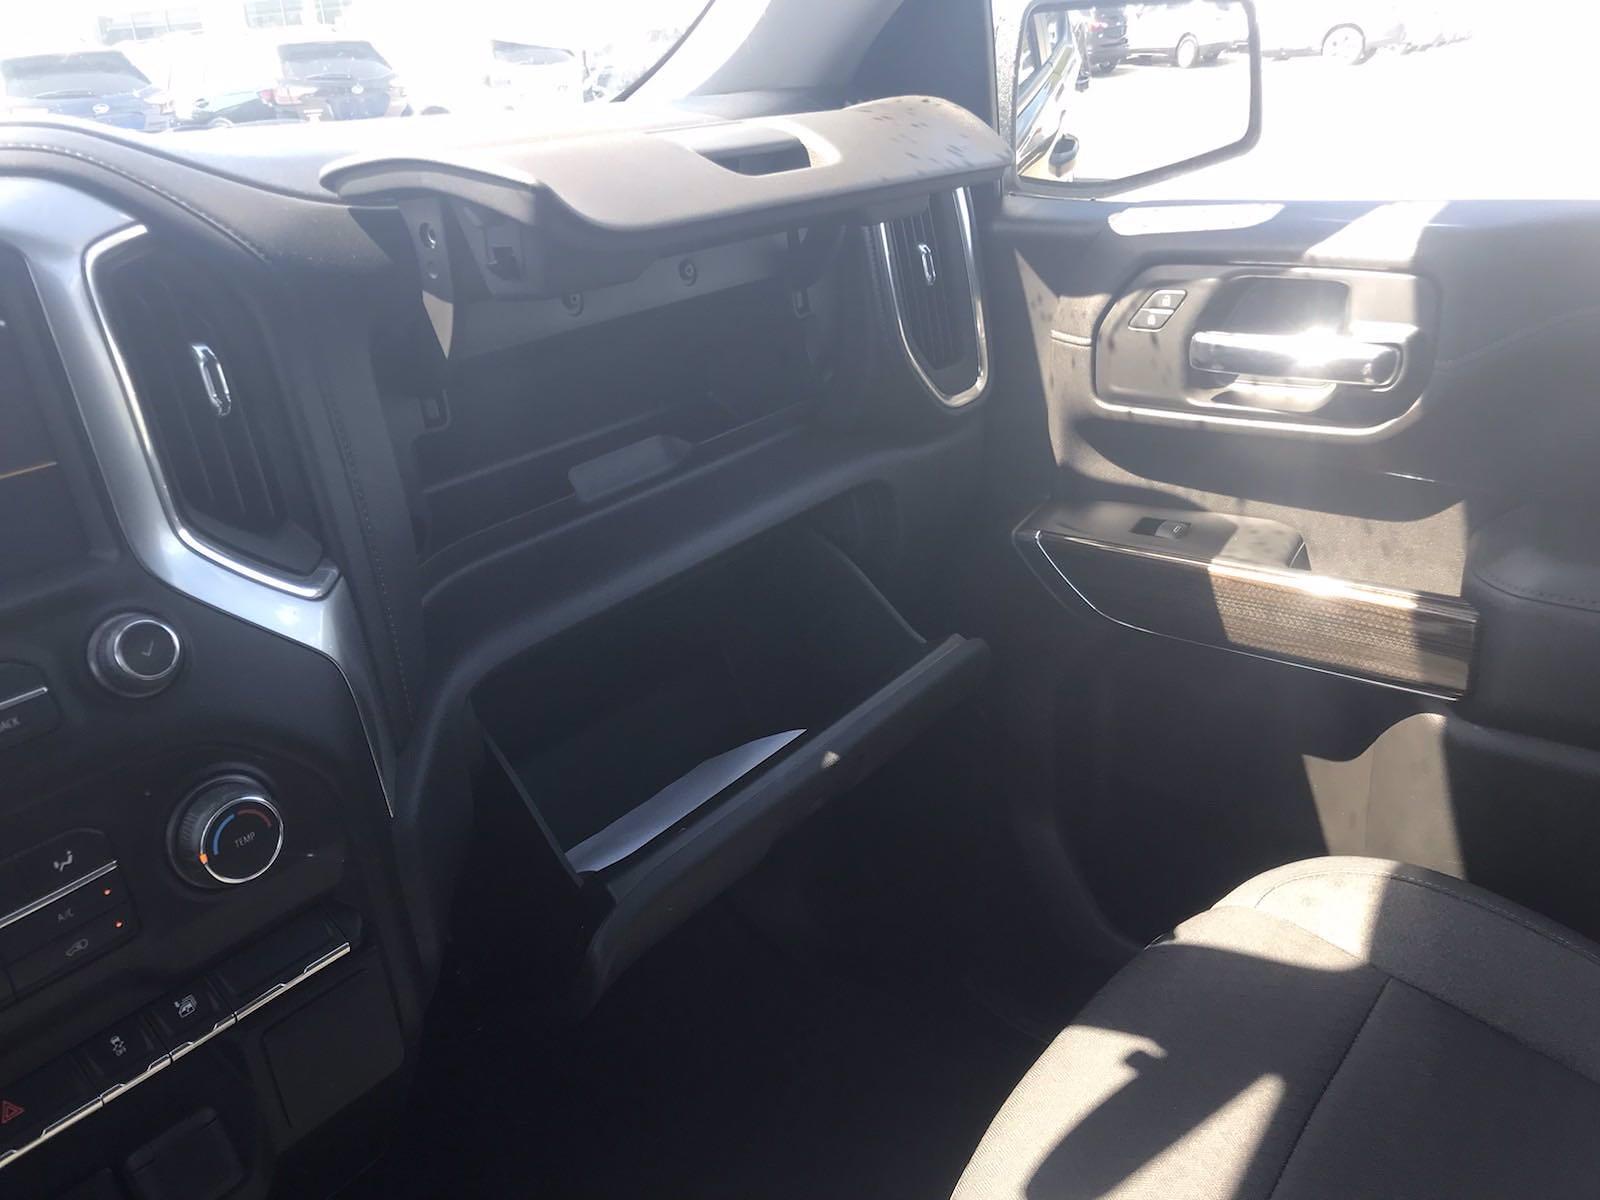 2019 Chevrolet Silverado 1500 Crew Cab 4x4, Pickup #16493PN - photo 36